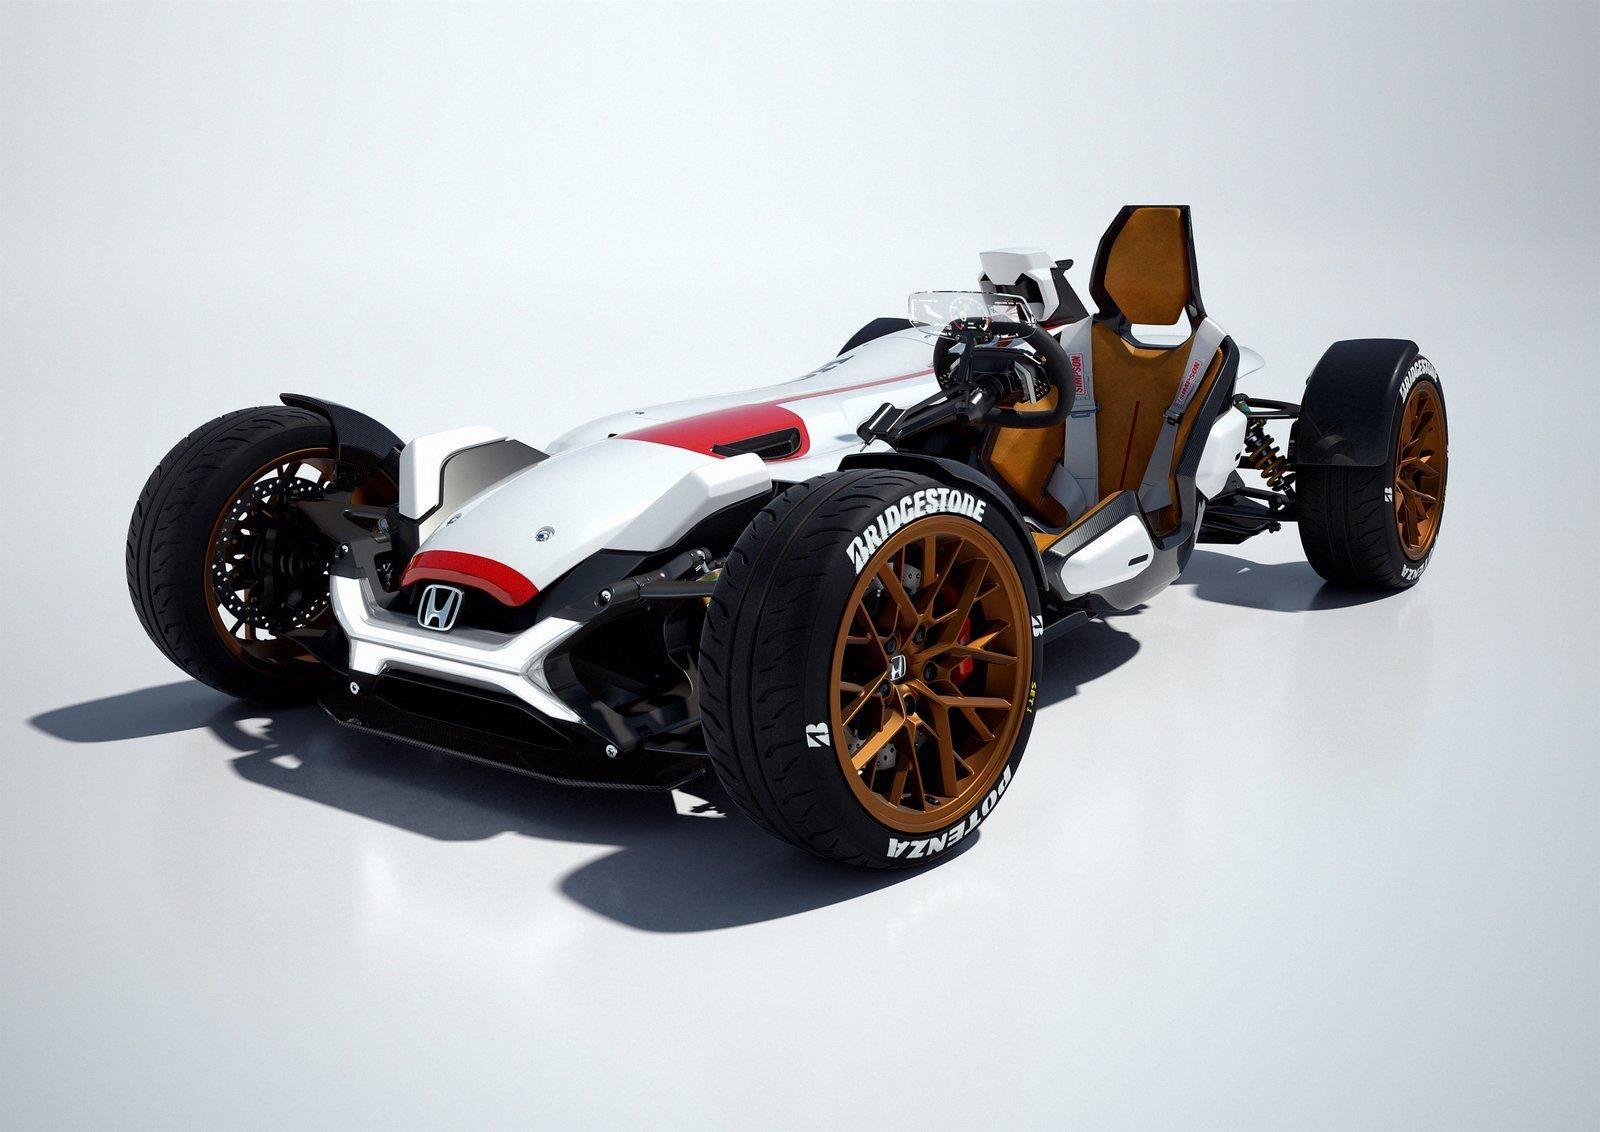 Francfort 2015 honda project 2 4 voitures honda - Voiture ariel atom ...